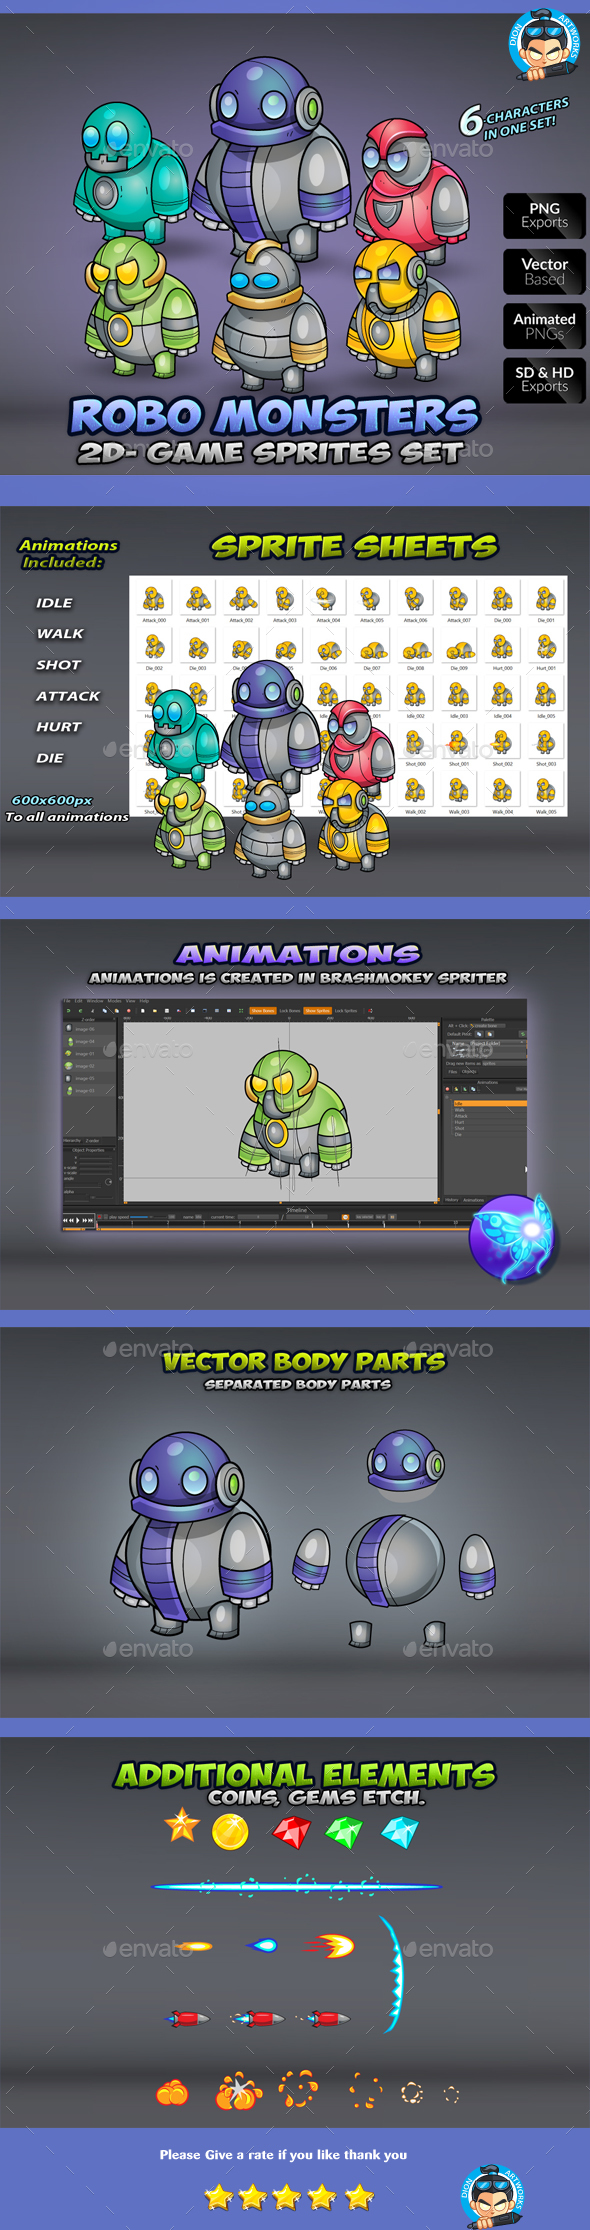 GraphicRiver Robo Monsters Game Enemies Sprites 21057250